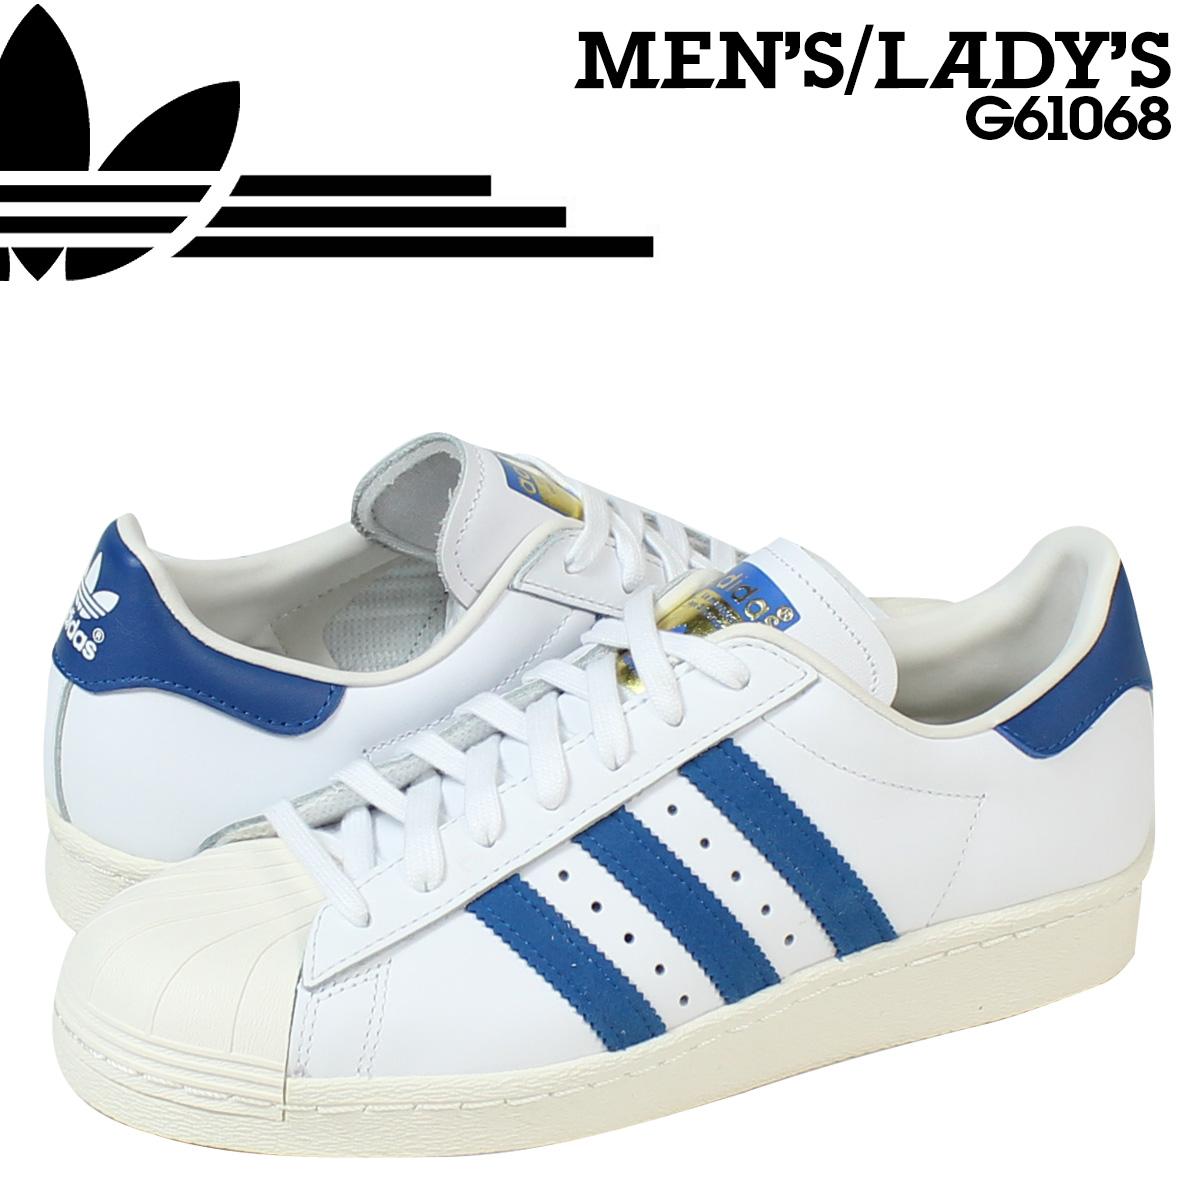 Adidas originals adidas Originals superstar